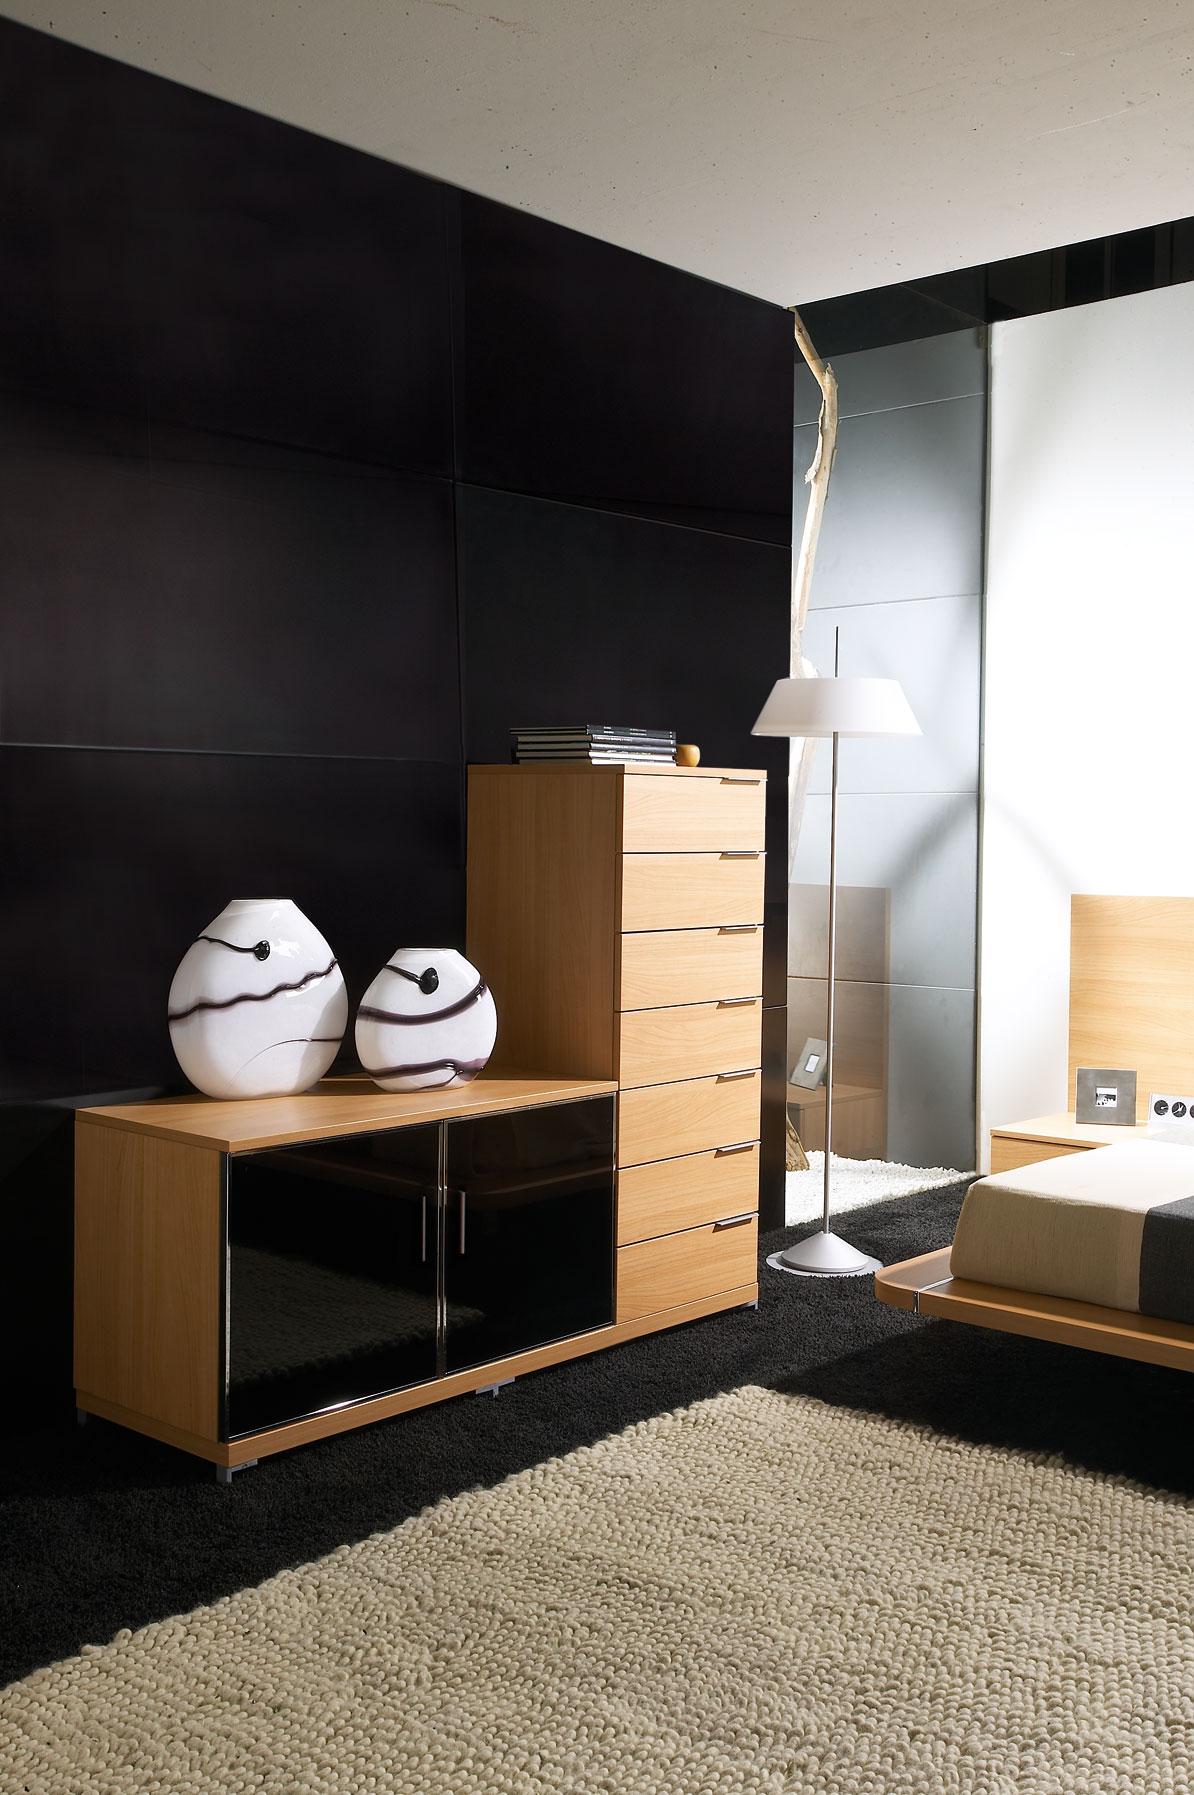 Dormitorios alf mobel dise o de muebles a medida - Dormitorios a medida ...